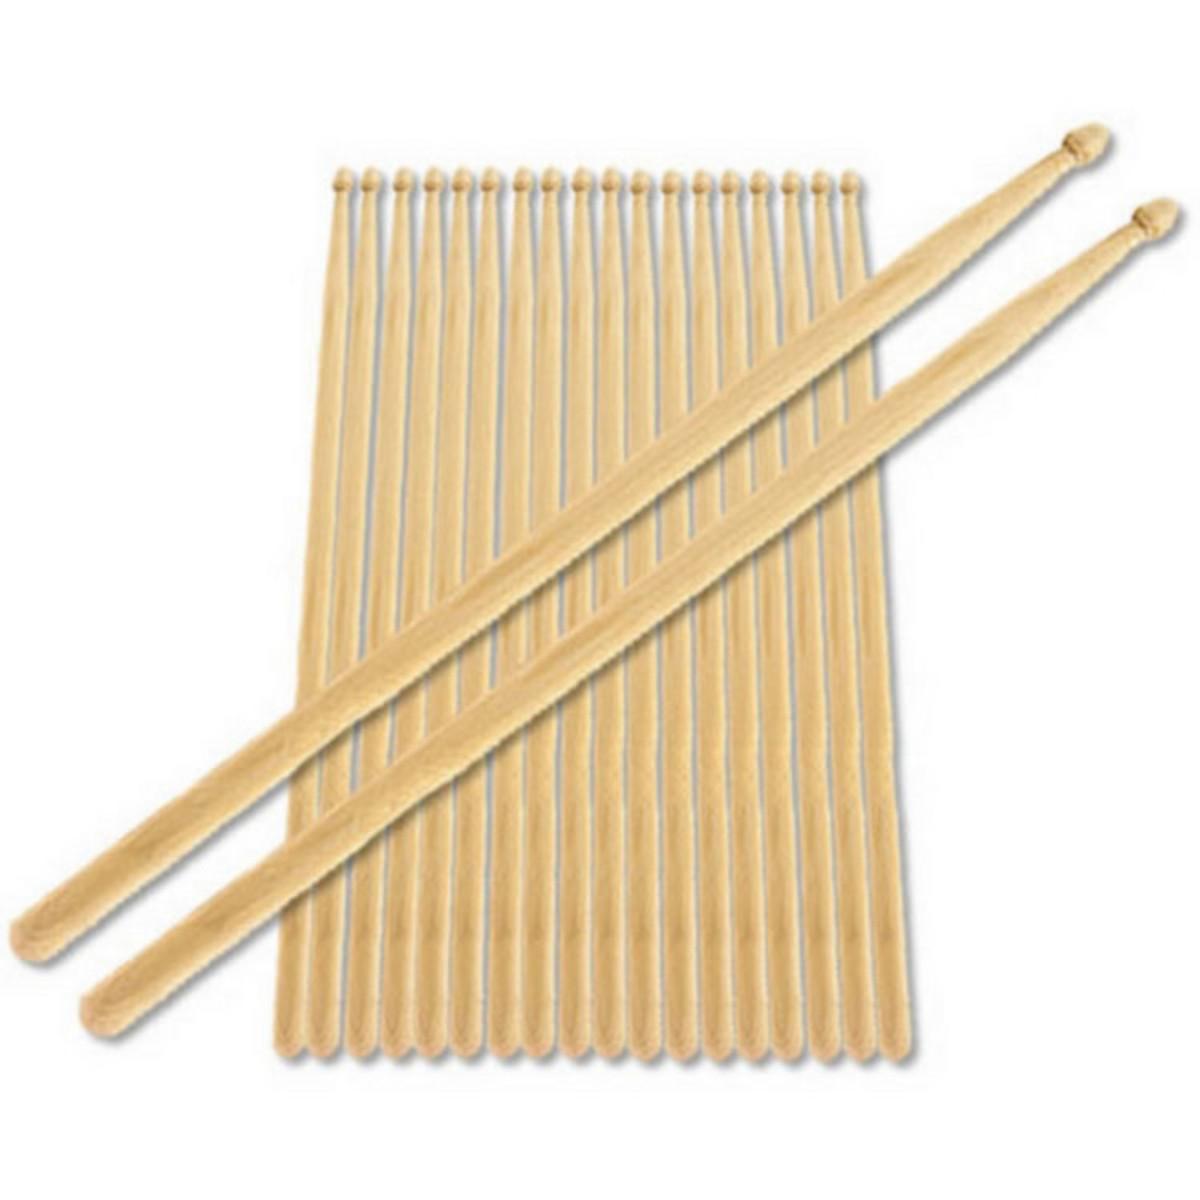 Image of 2B Nylon Tip Drumstick Bundle Pack of 10